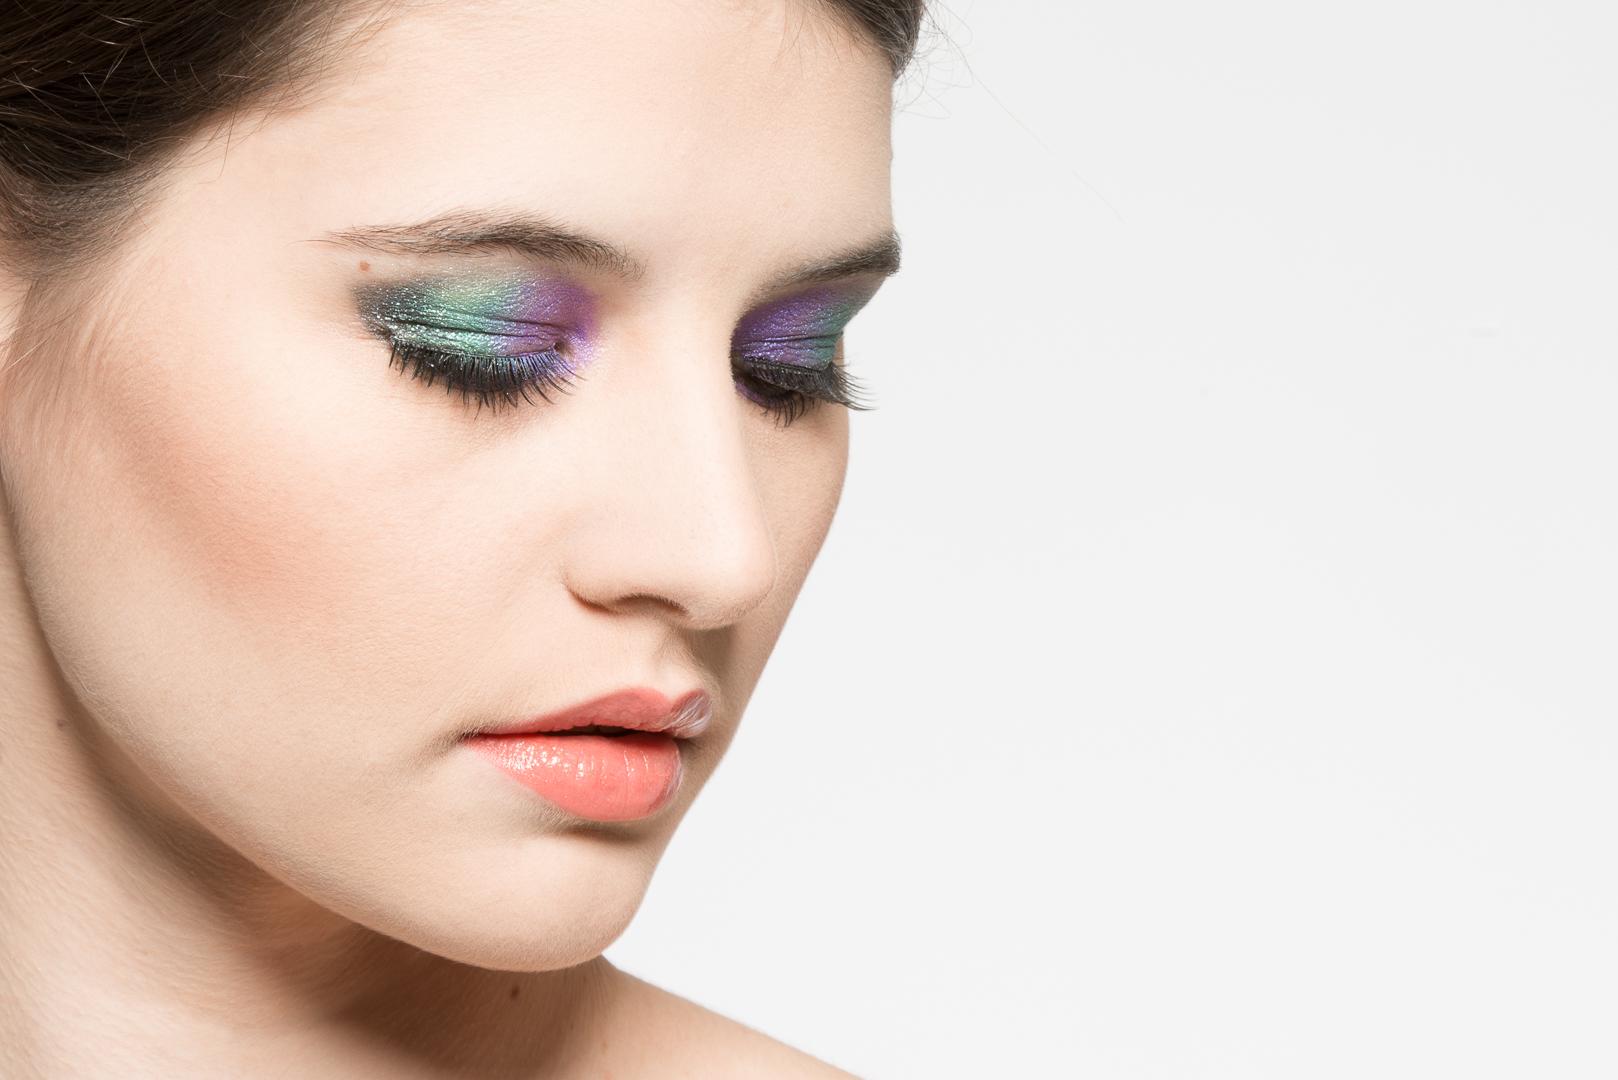 Make Up Artist Und Visagistin Ausbildung Make Up Academy: Johanna Make-Up Artist